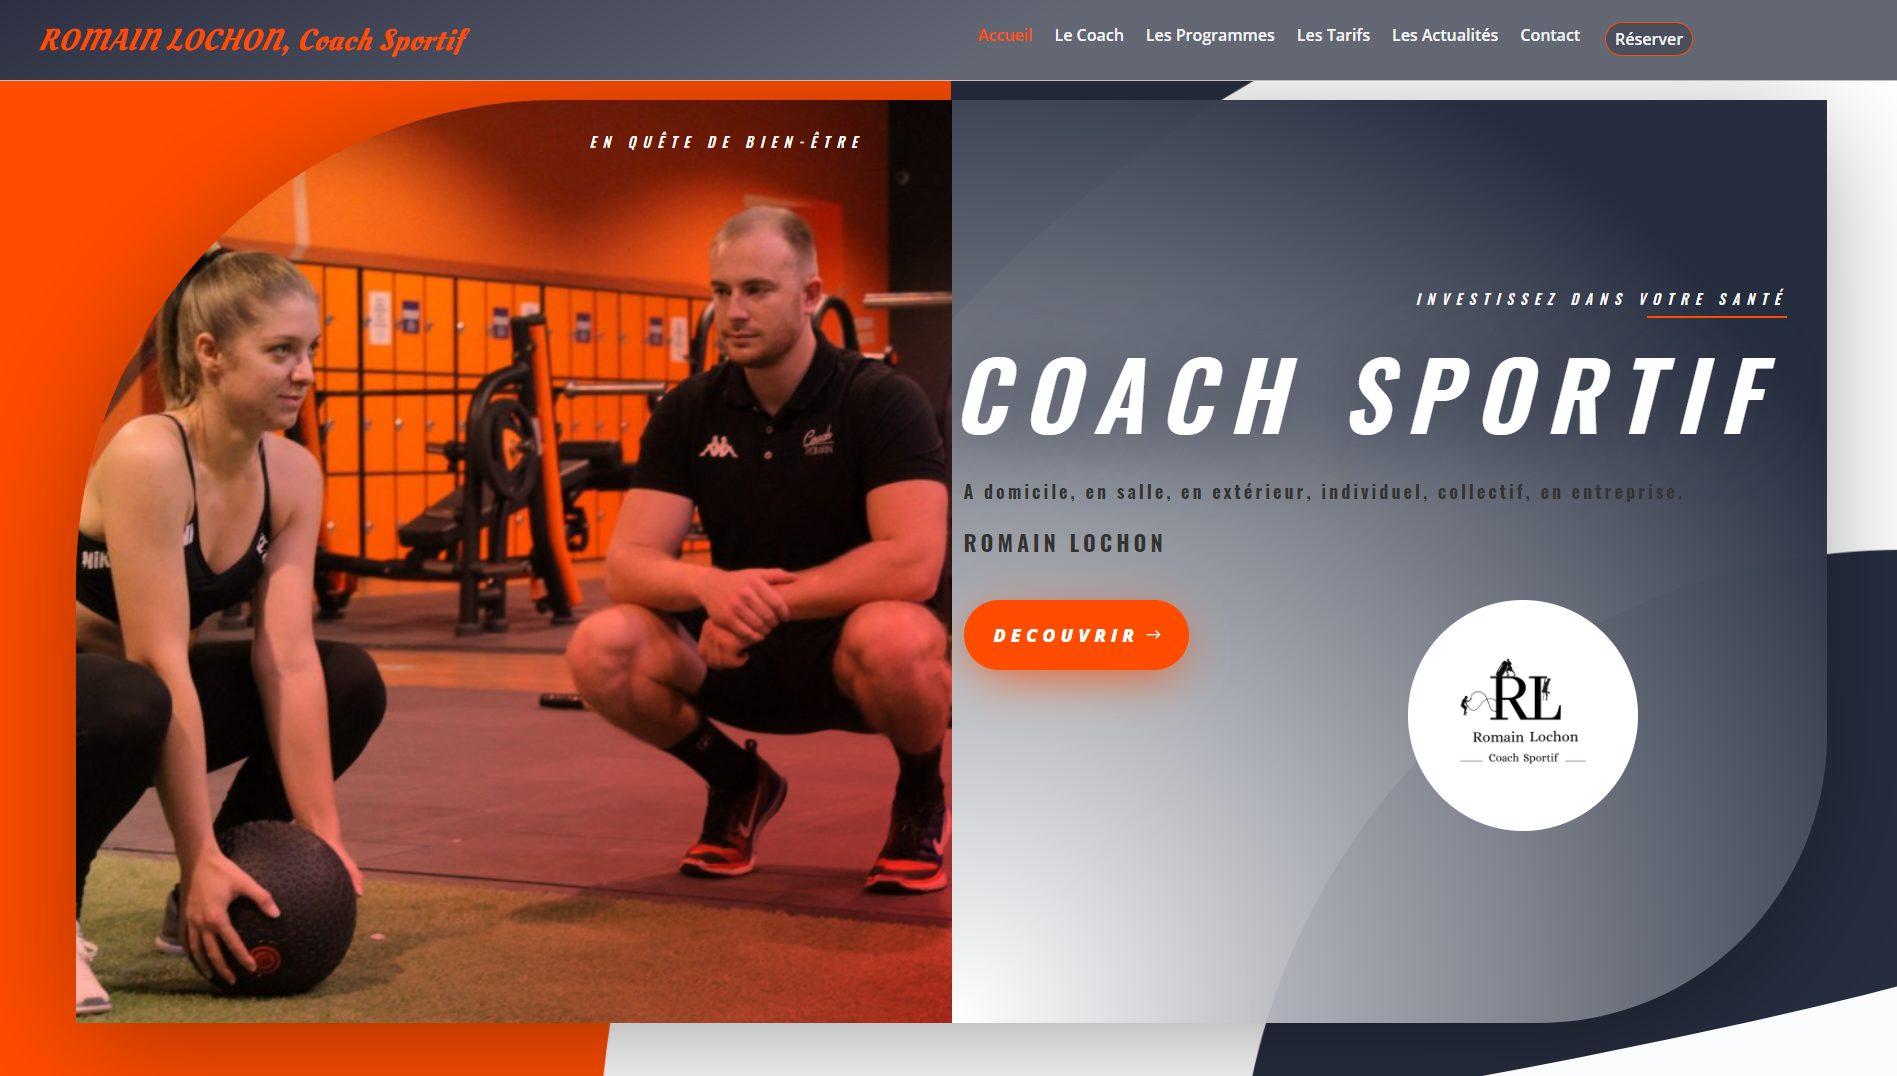 coach sportif romain lochon